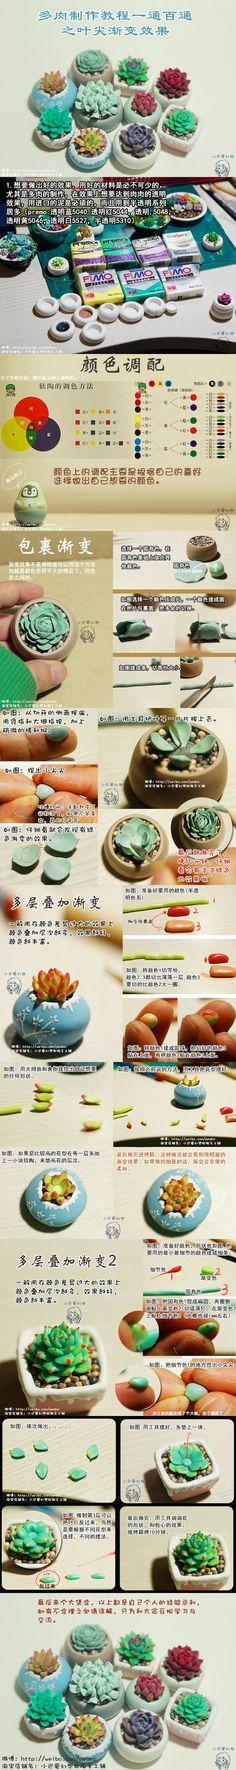 Succulent pots how to